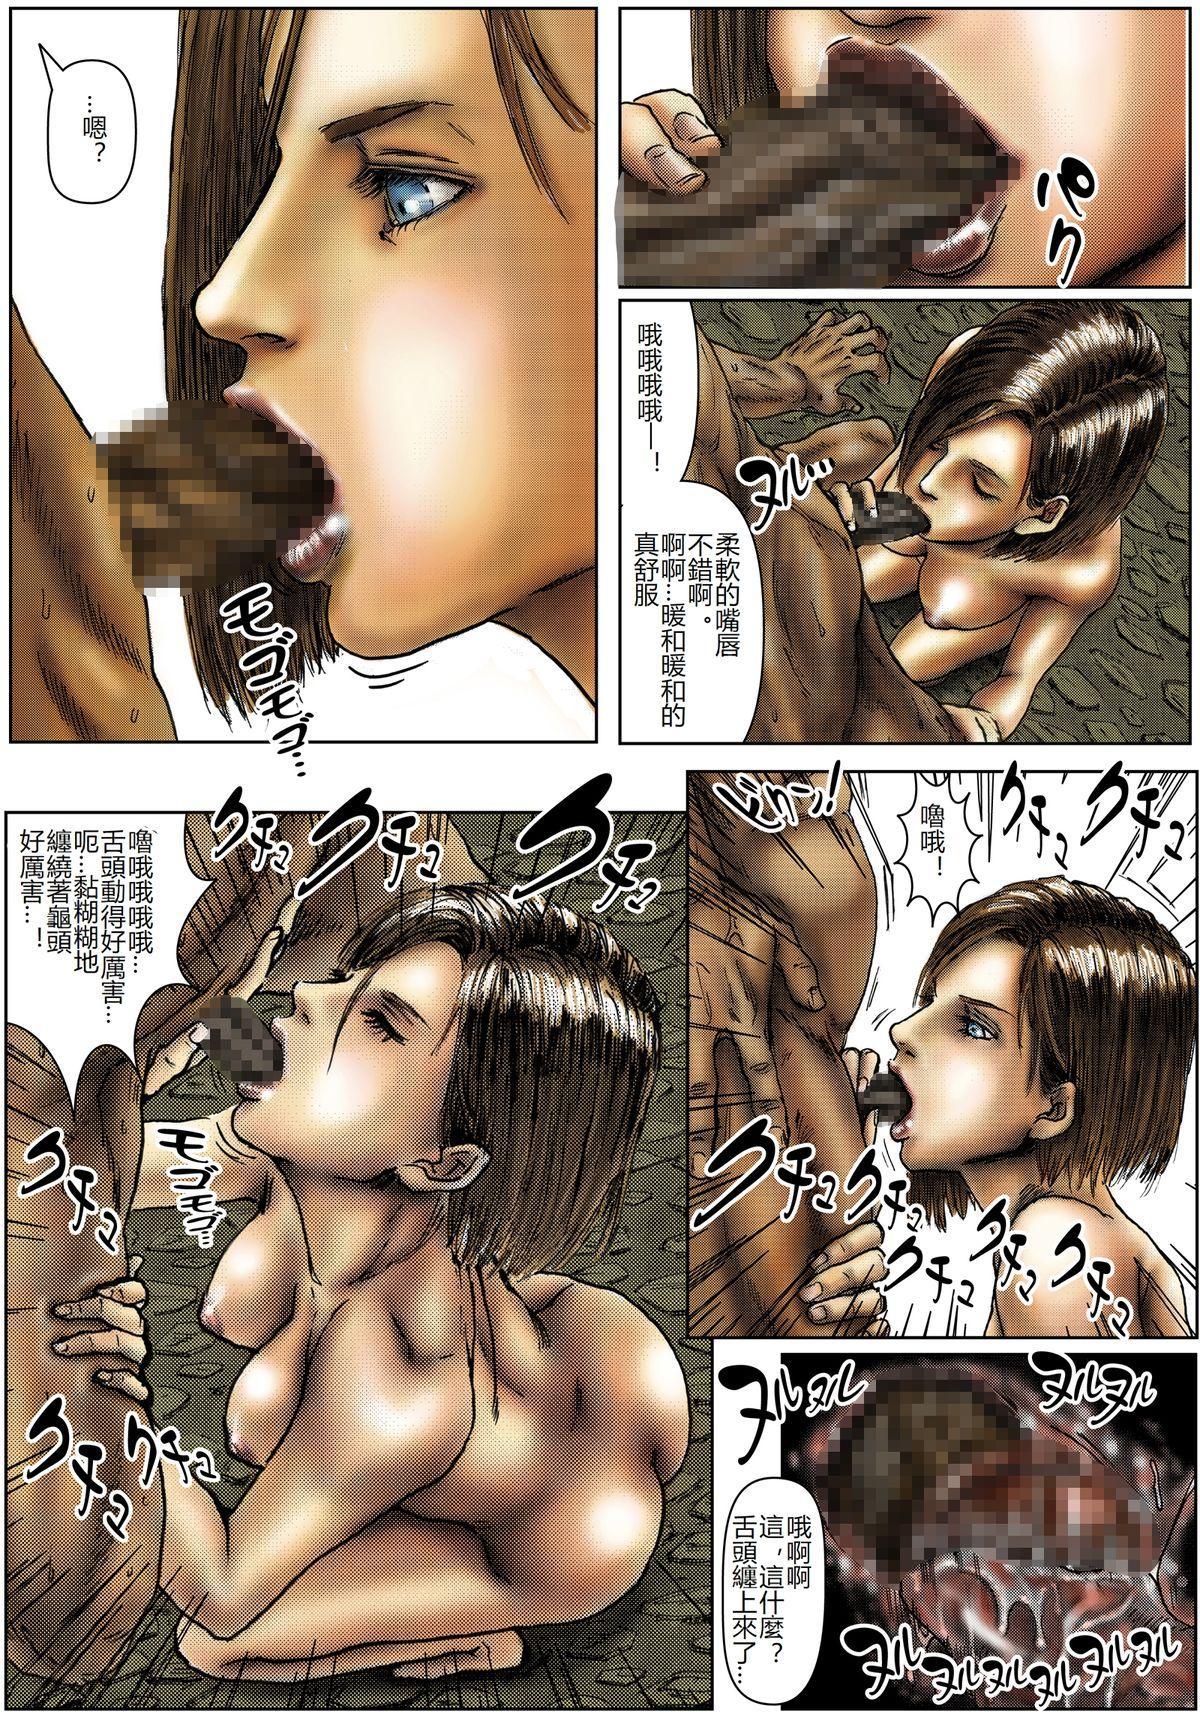 BODY HAZARD 5 Shushou Hen 31